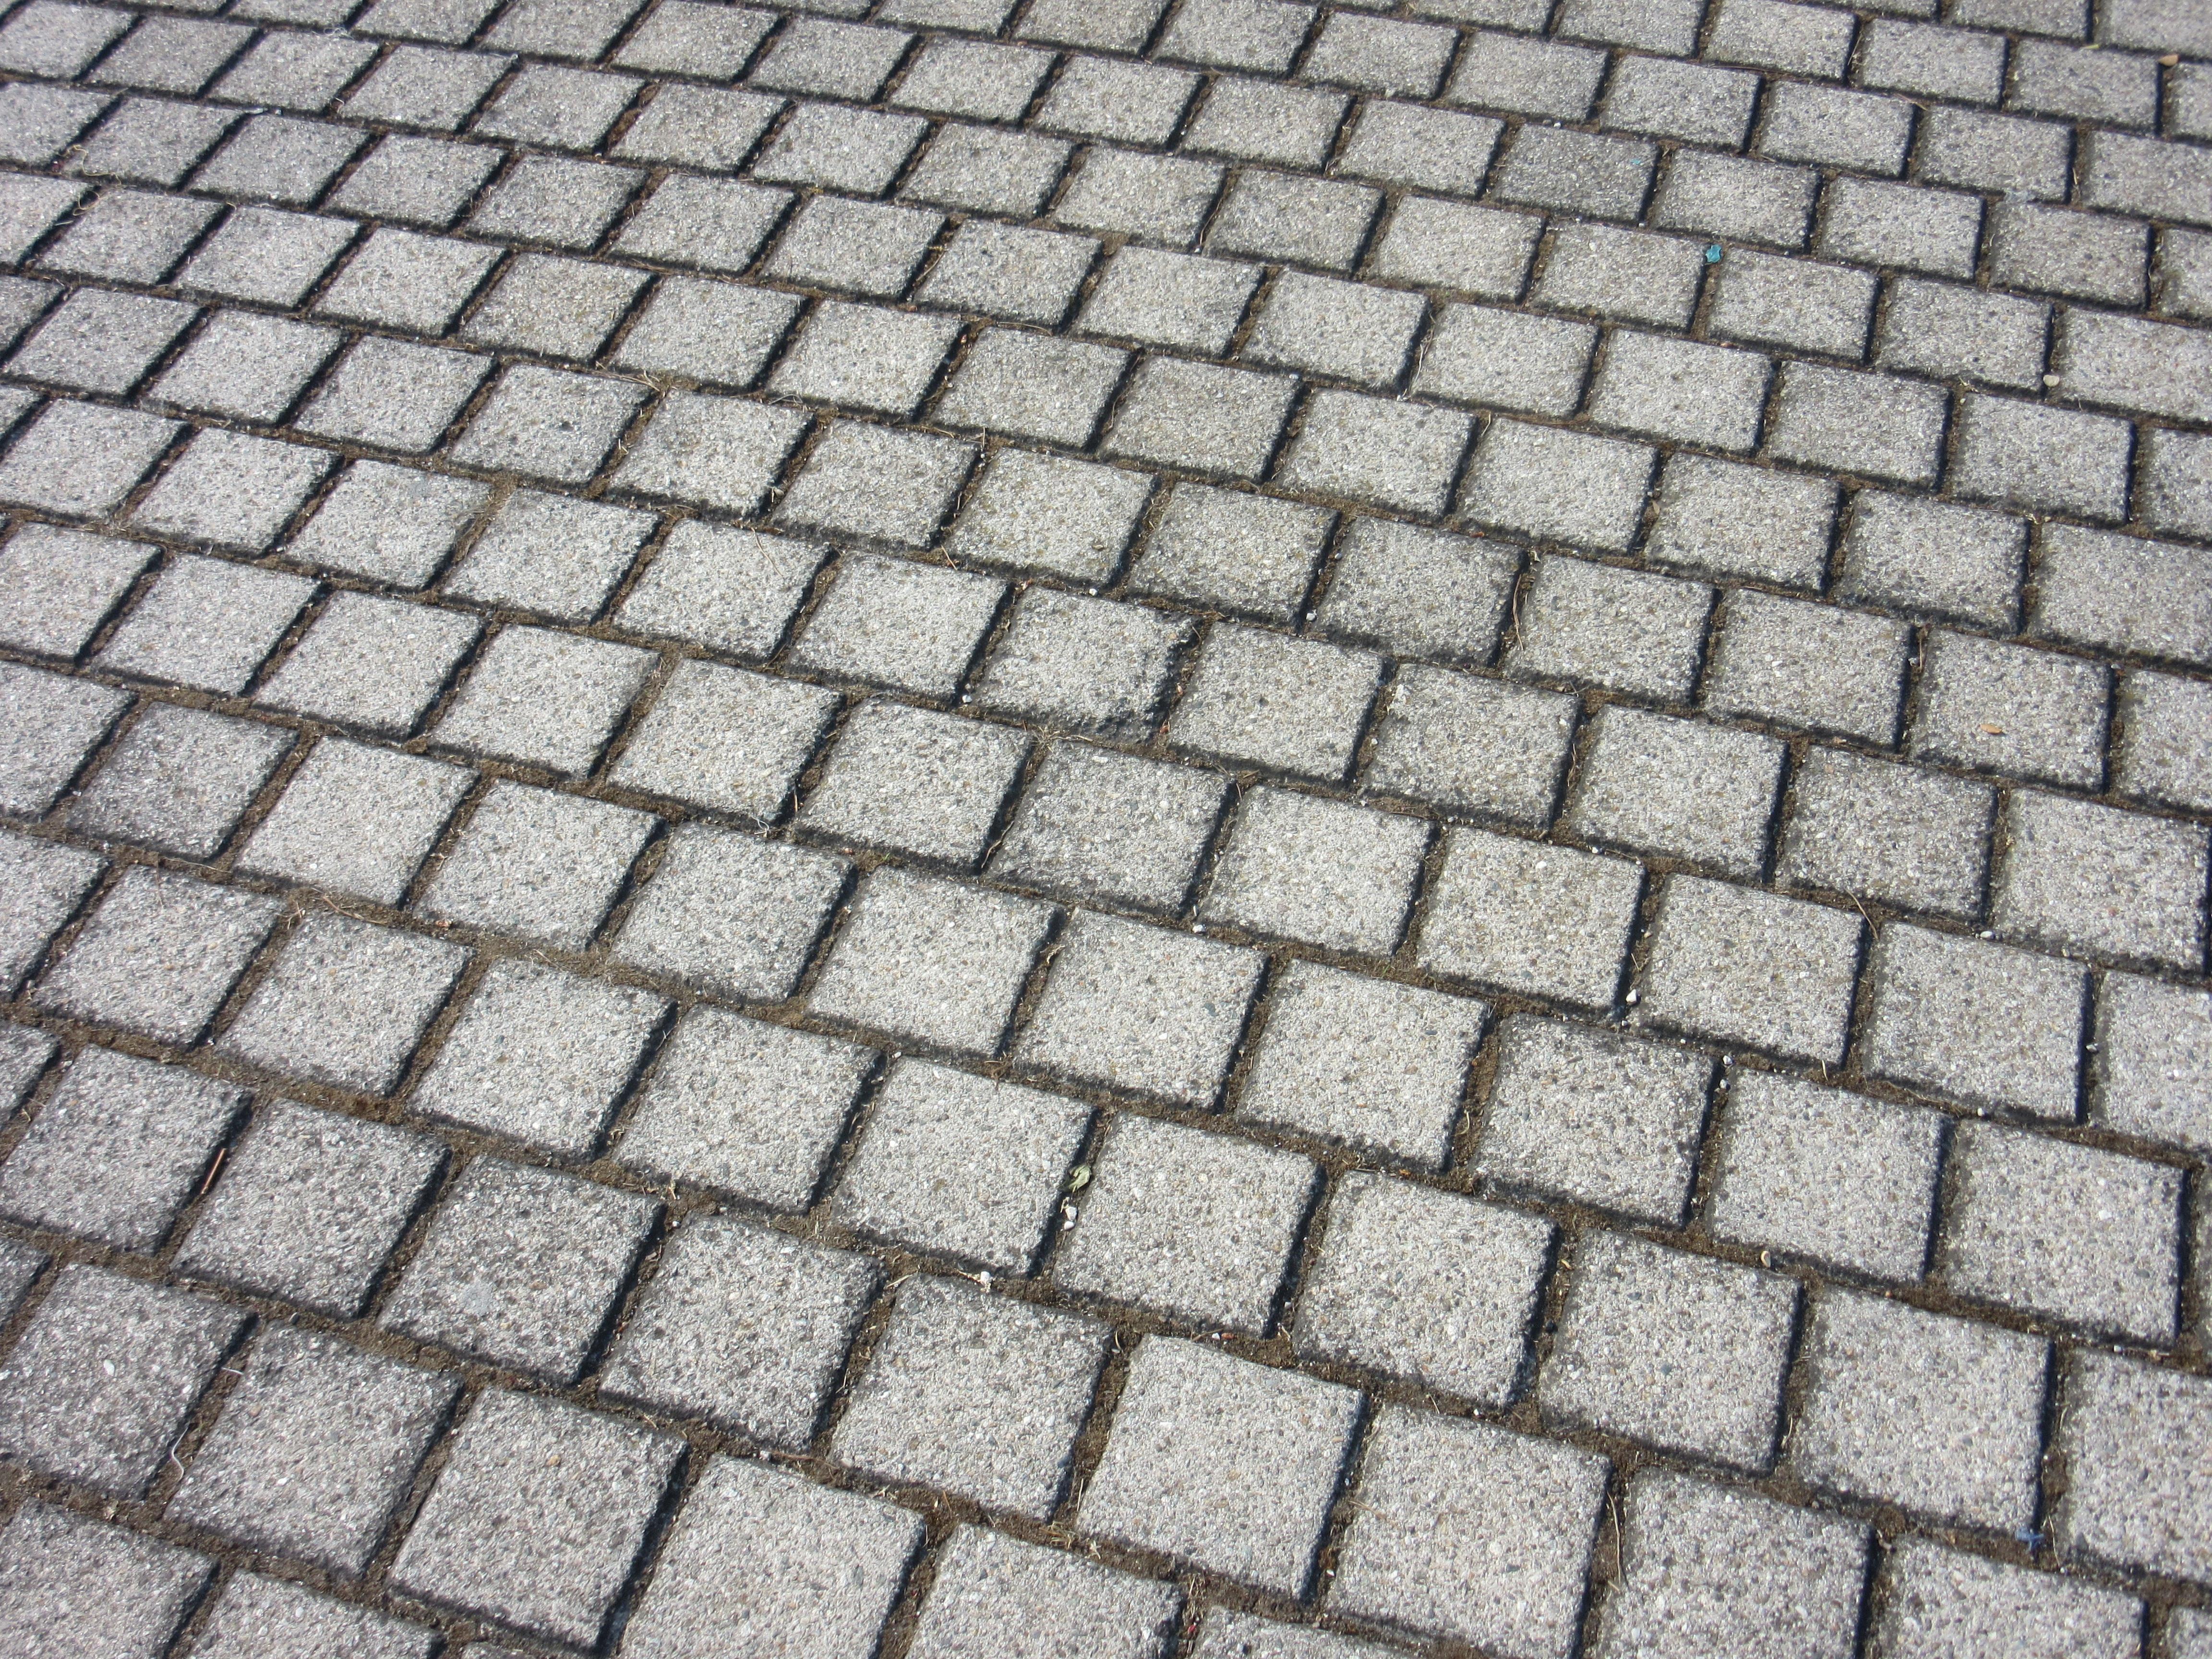 cobblestone floor texture. Brilliant Texture Structure Texture Sidewalk Floor Roof Cobblestone Asphalt Pattern Geometry  Brick Lane Material Concrete Patch Grey Art And Cobblestone Floor Texture